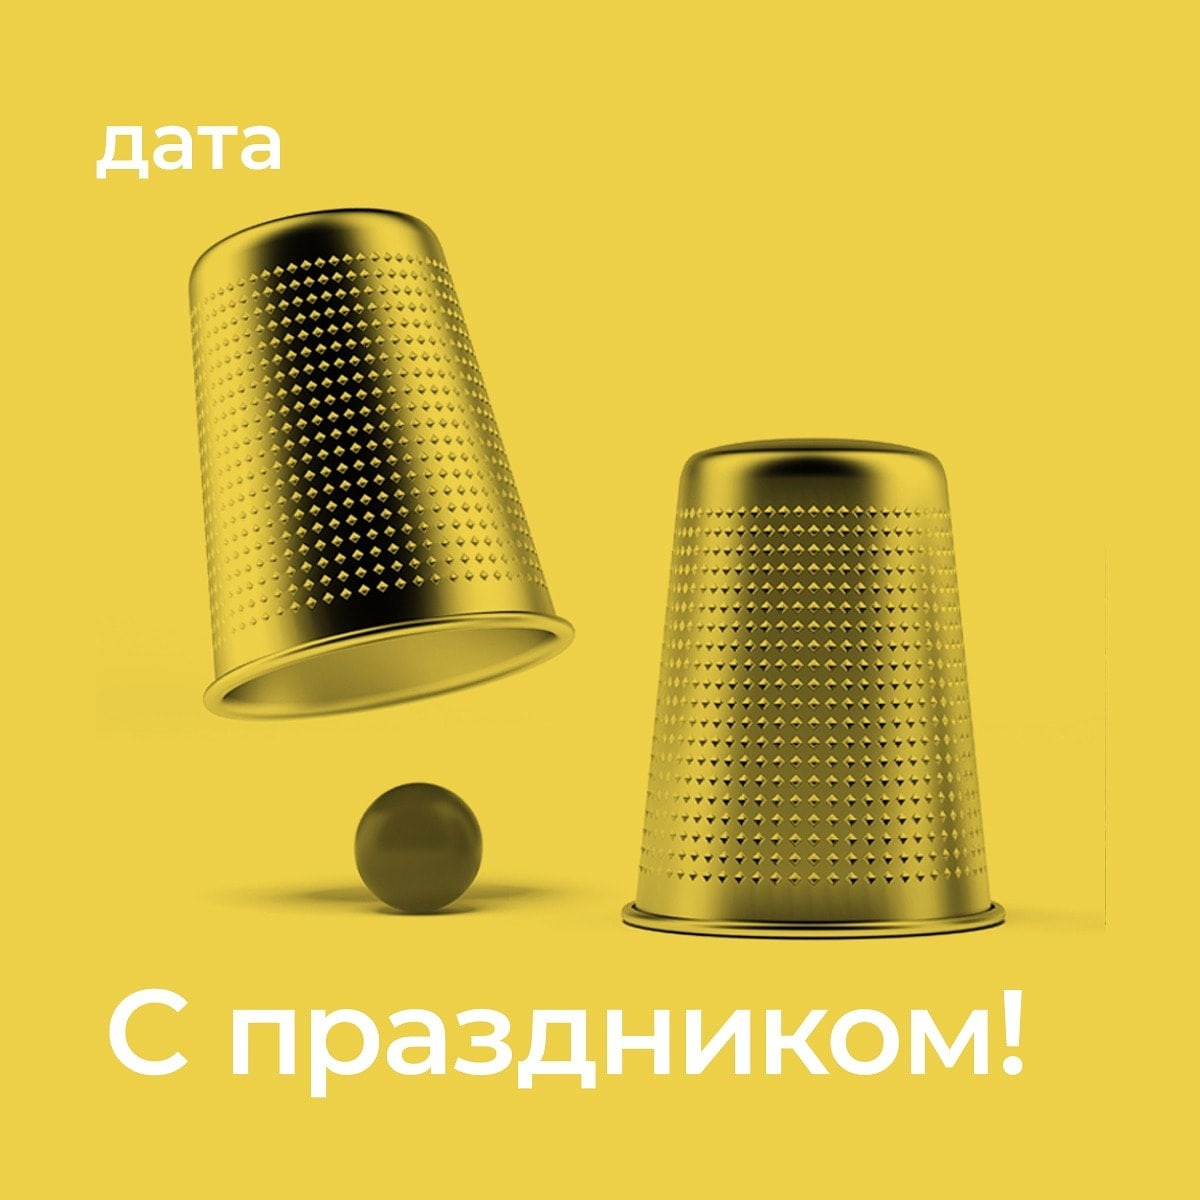 фото из альбома Александра Литвина №14